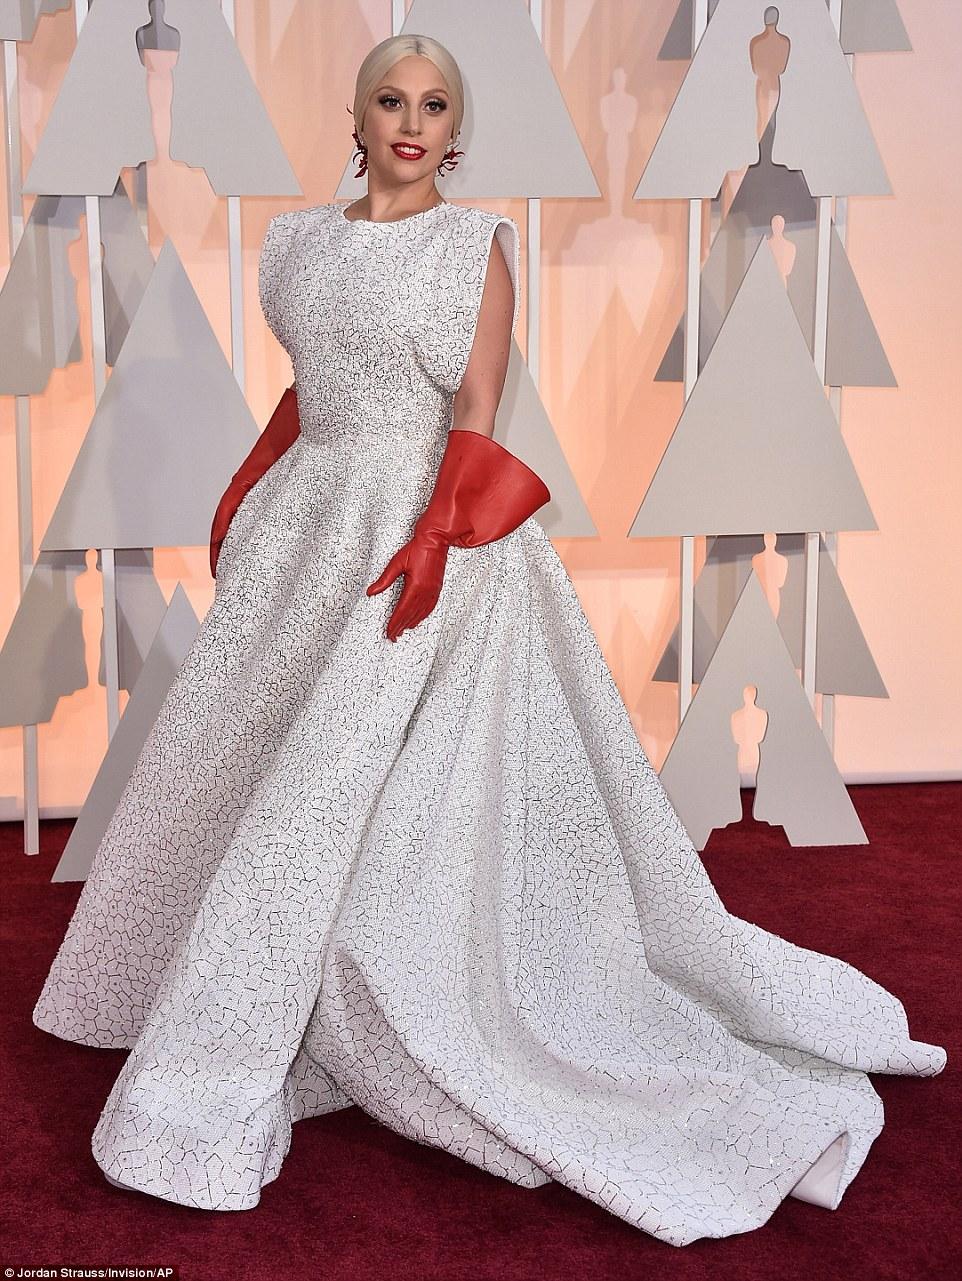 https://i1.wp.com/i.dailymail.co.uk/i/pix/2015/02/23/25F7F21600000578-2964465-Lady_Gaga_wears_three_custom_made_Azzedine_Ala_a_pieces_his_firs-a-5_1424674282991.jpg